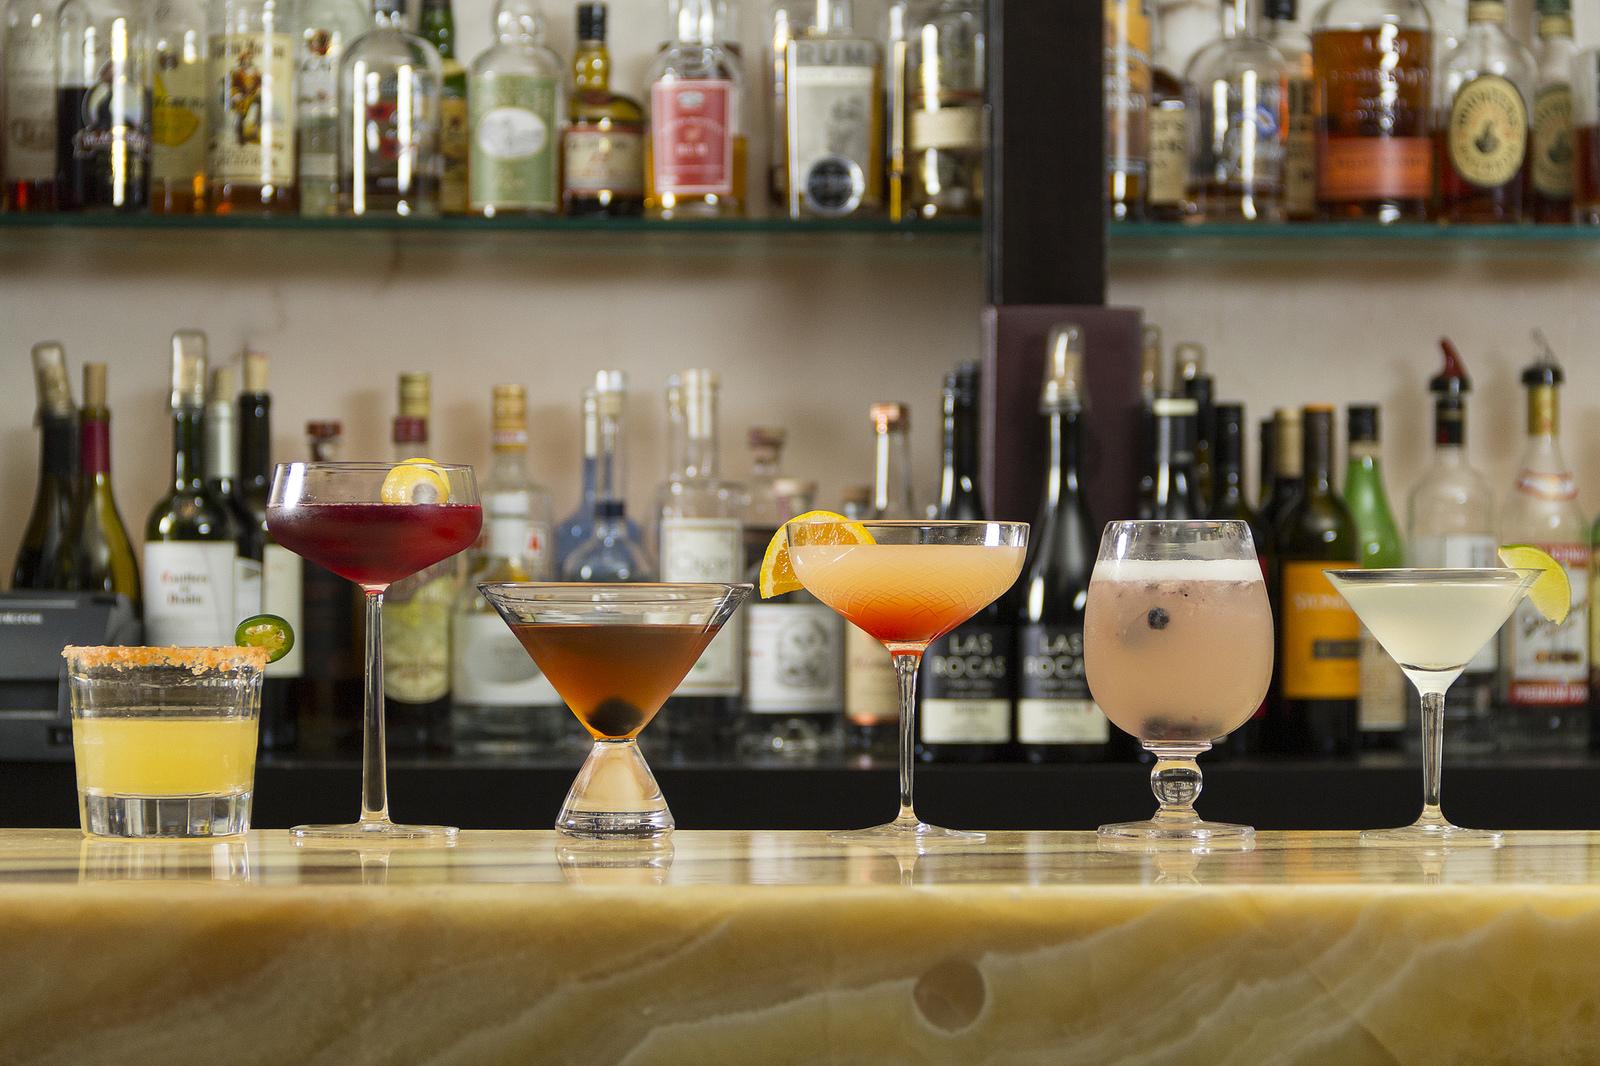 Glassware cocktail shoot at Nubar